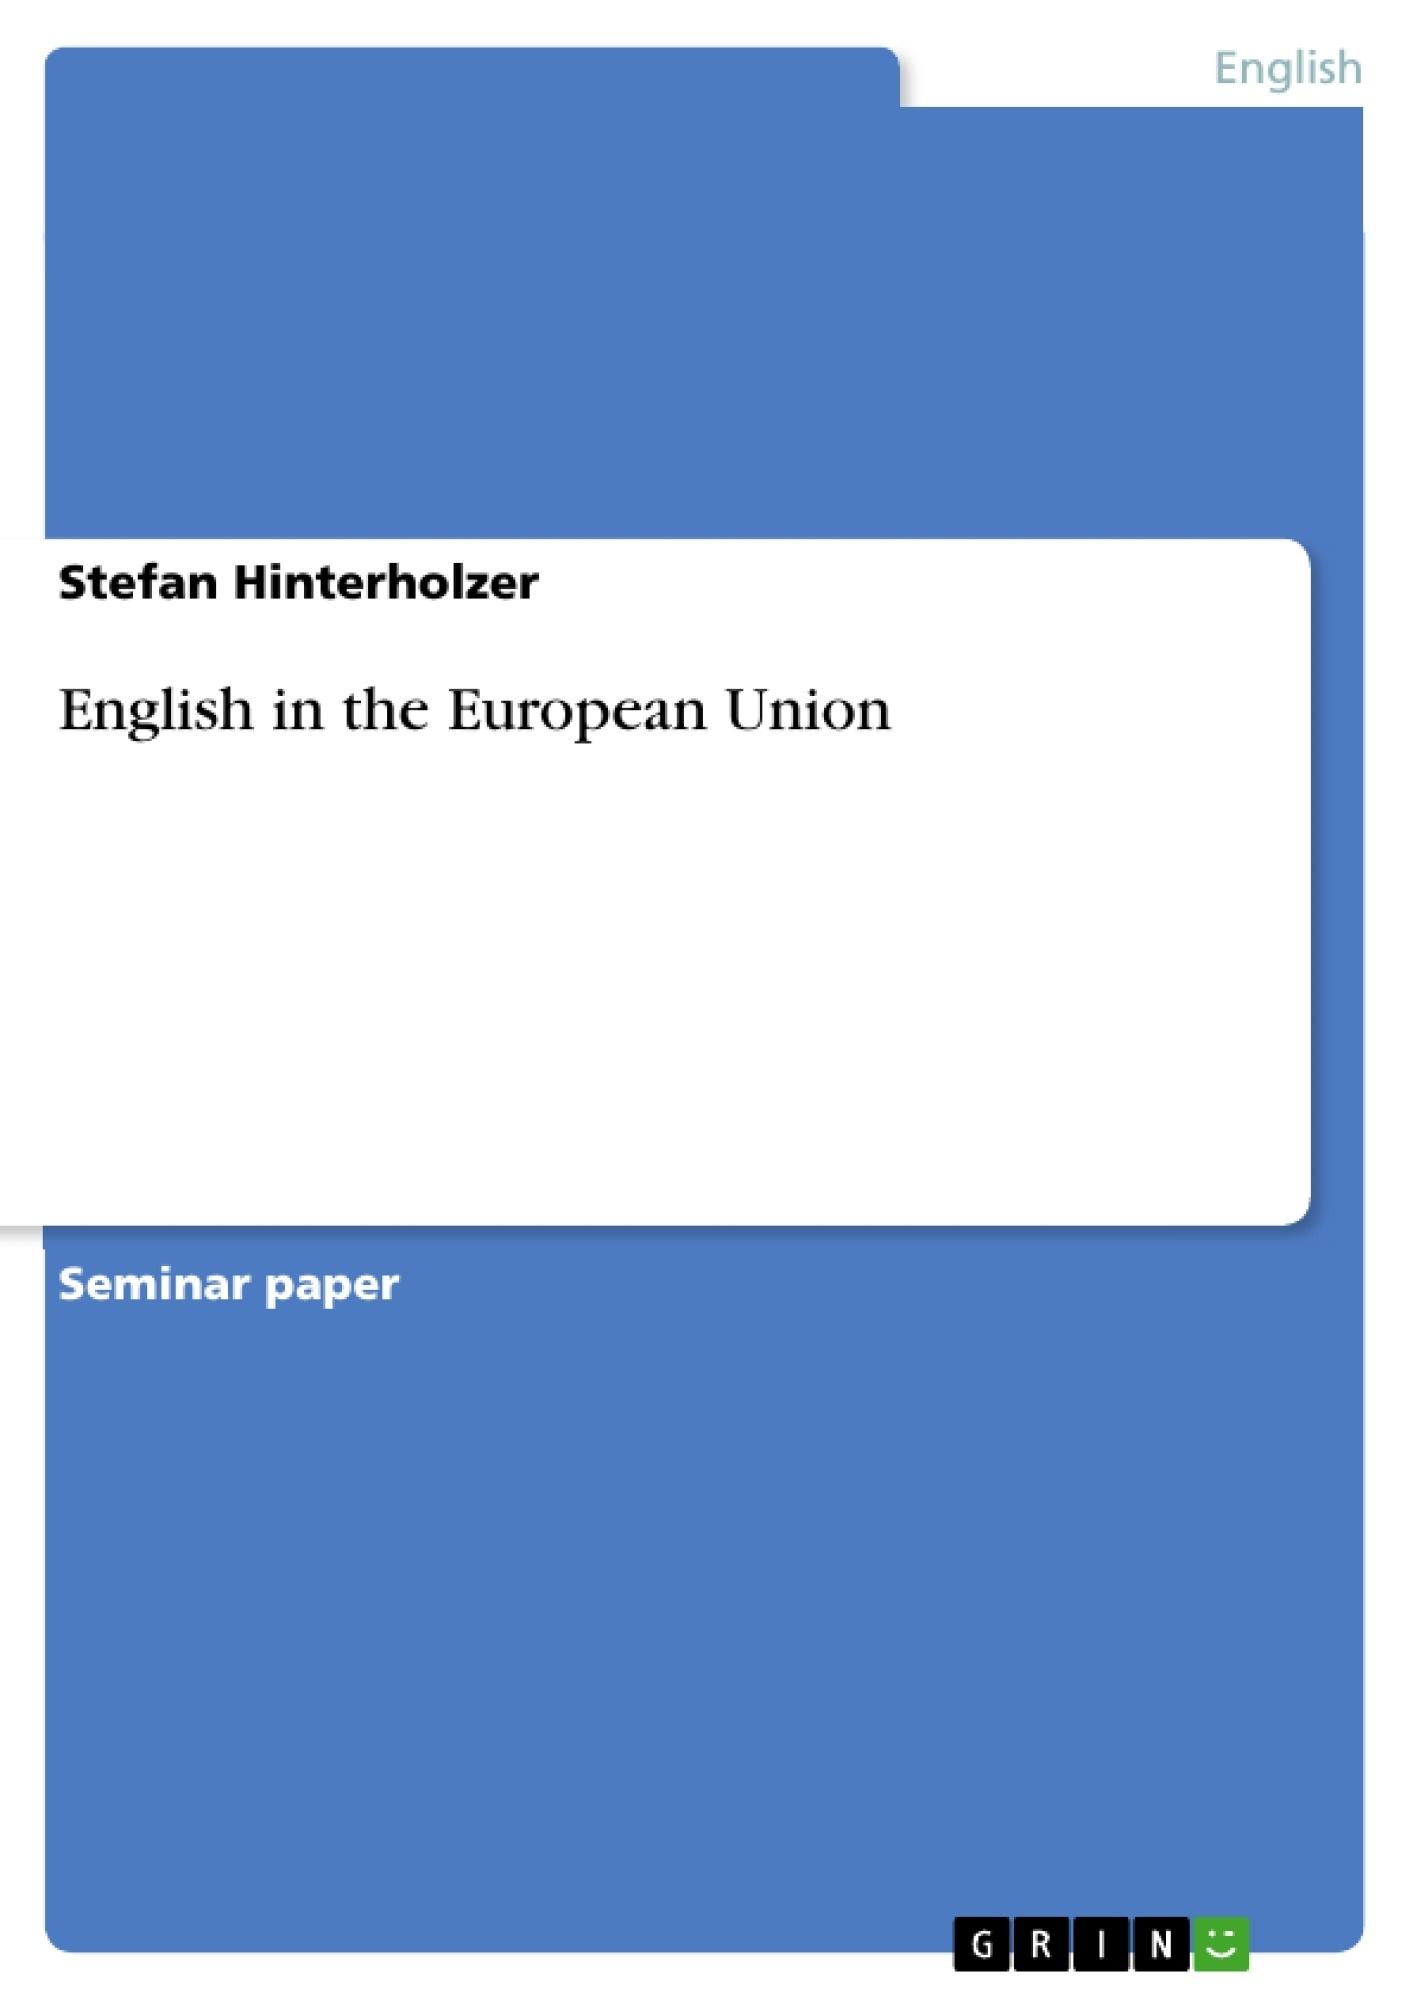 Title: English in the European Union